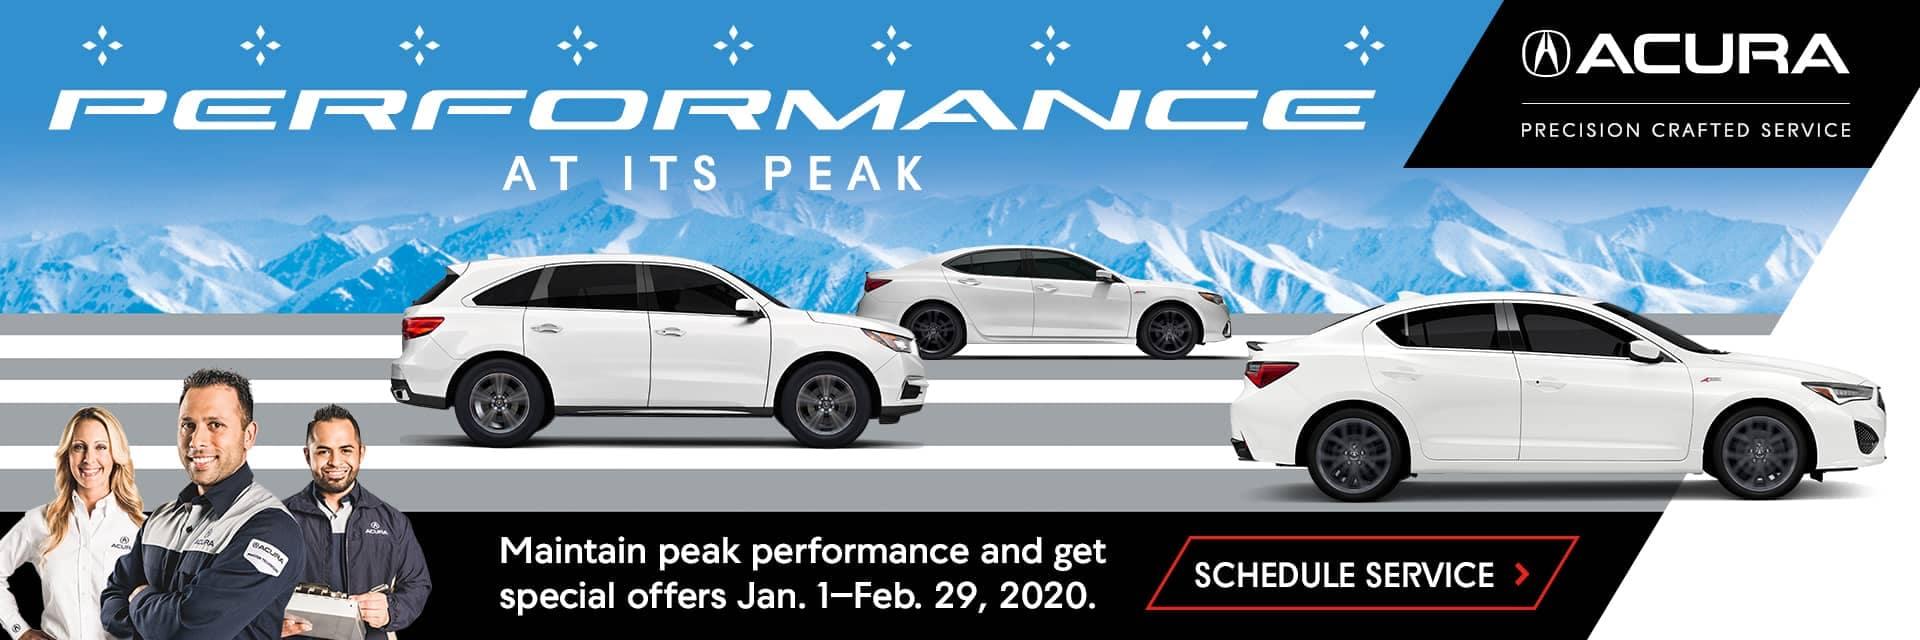 Maintain peak performance banner